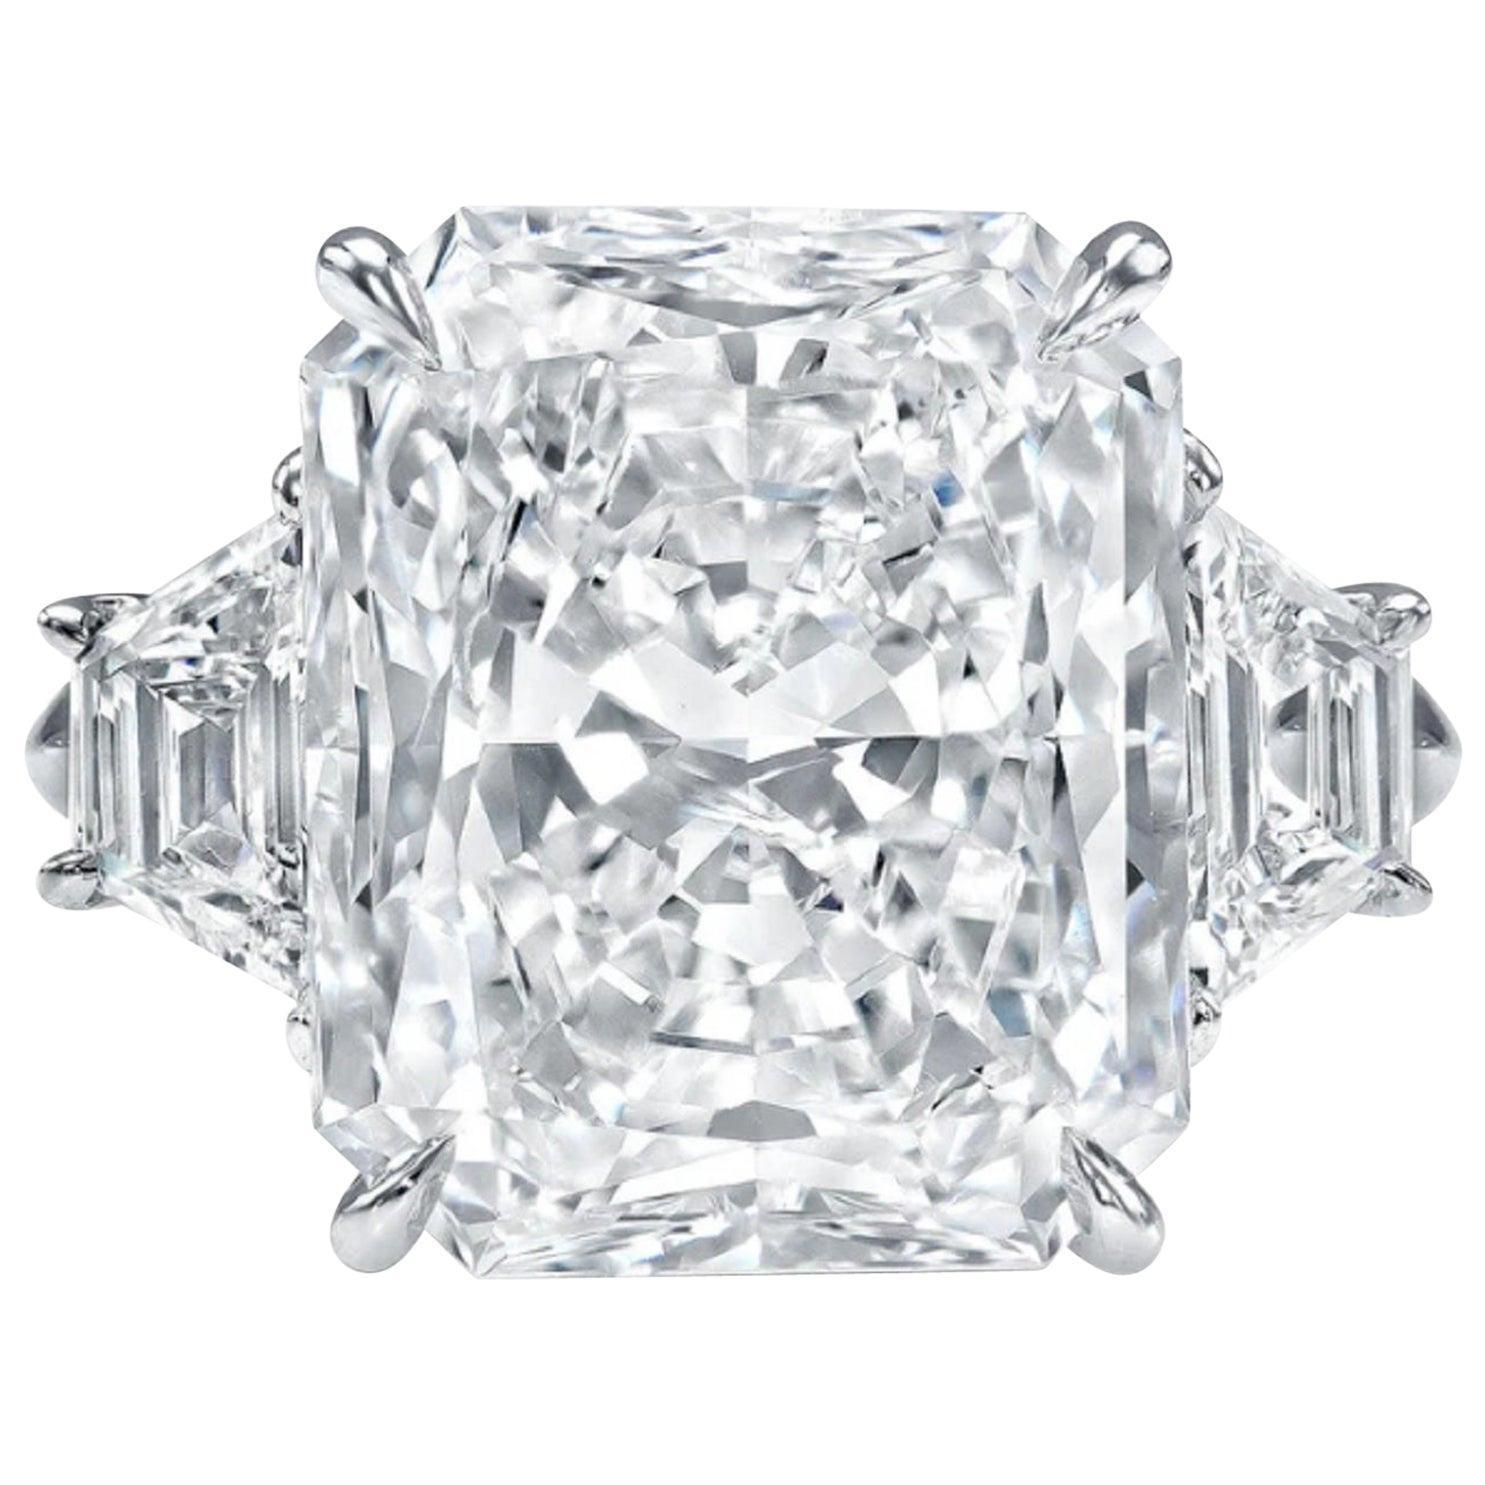 GIA Certified 2.80 Carat Radiant Cut Diamond Ring VVS1 Clarity